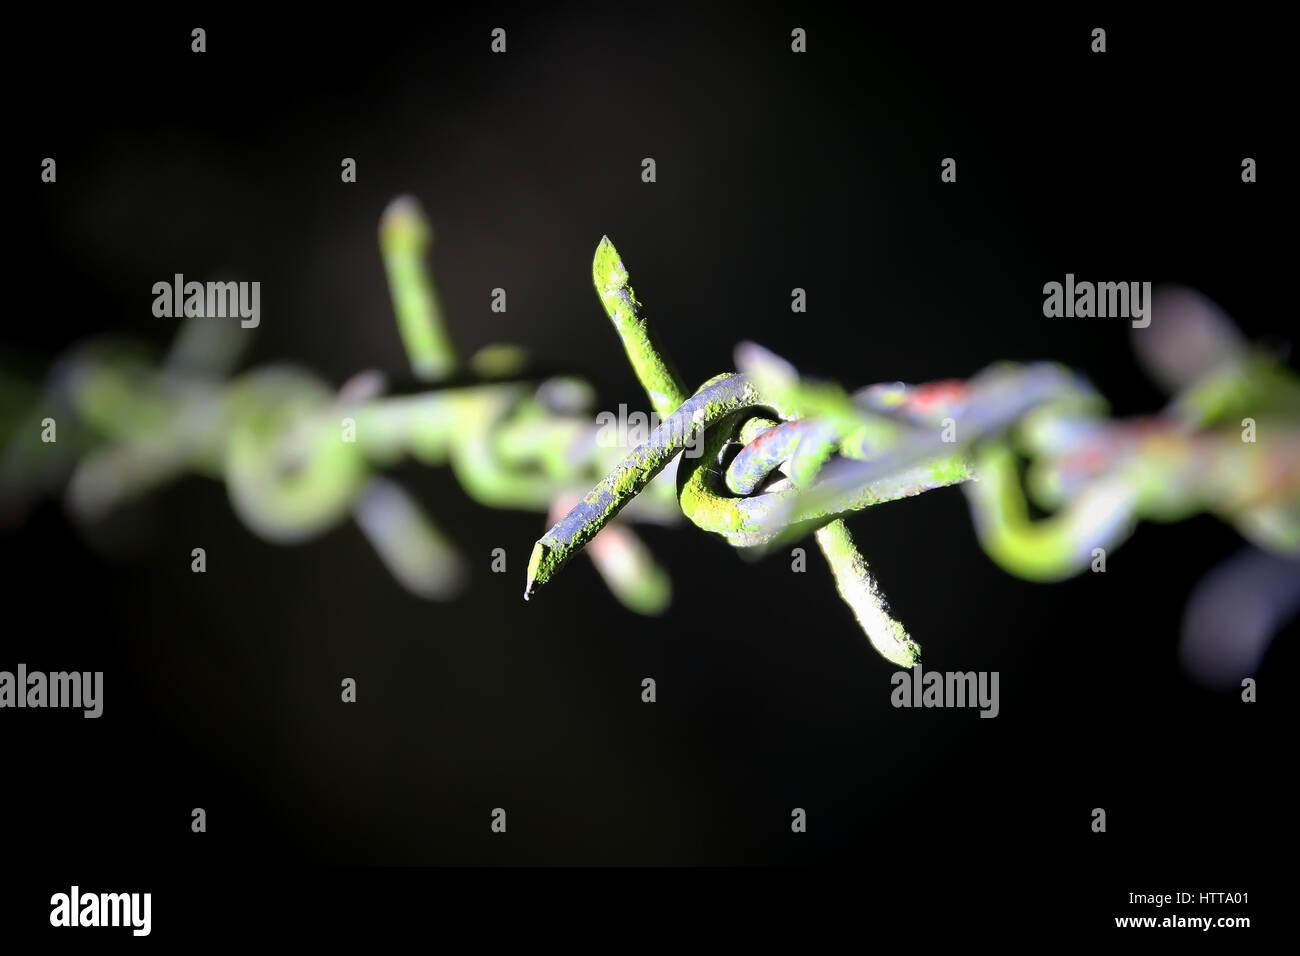 Geschlossen bis abstrakte Hindernis - Stacheldraht mit grünem Moos Stockbild